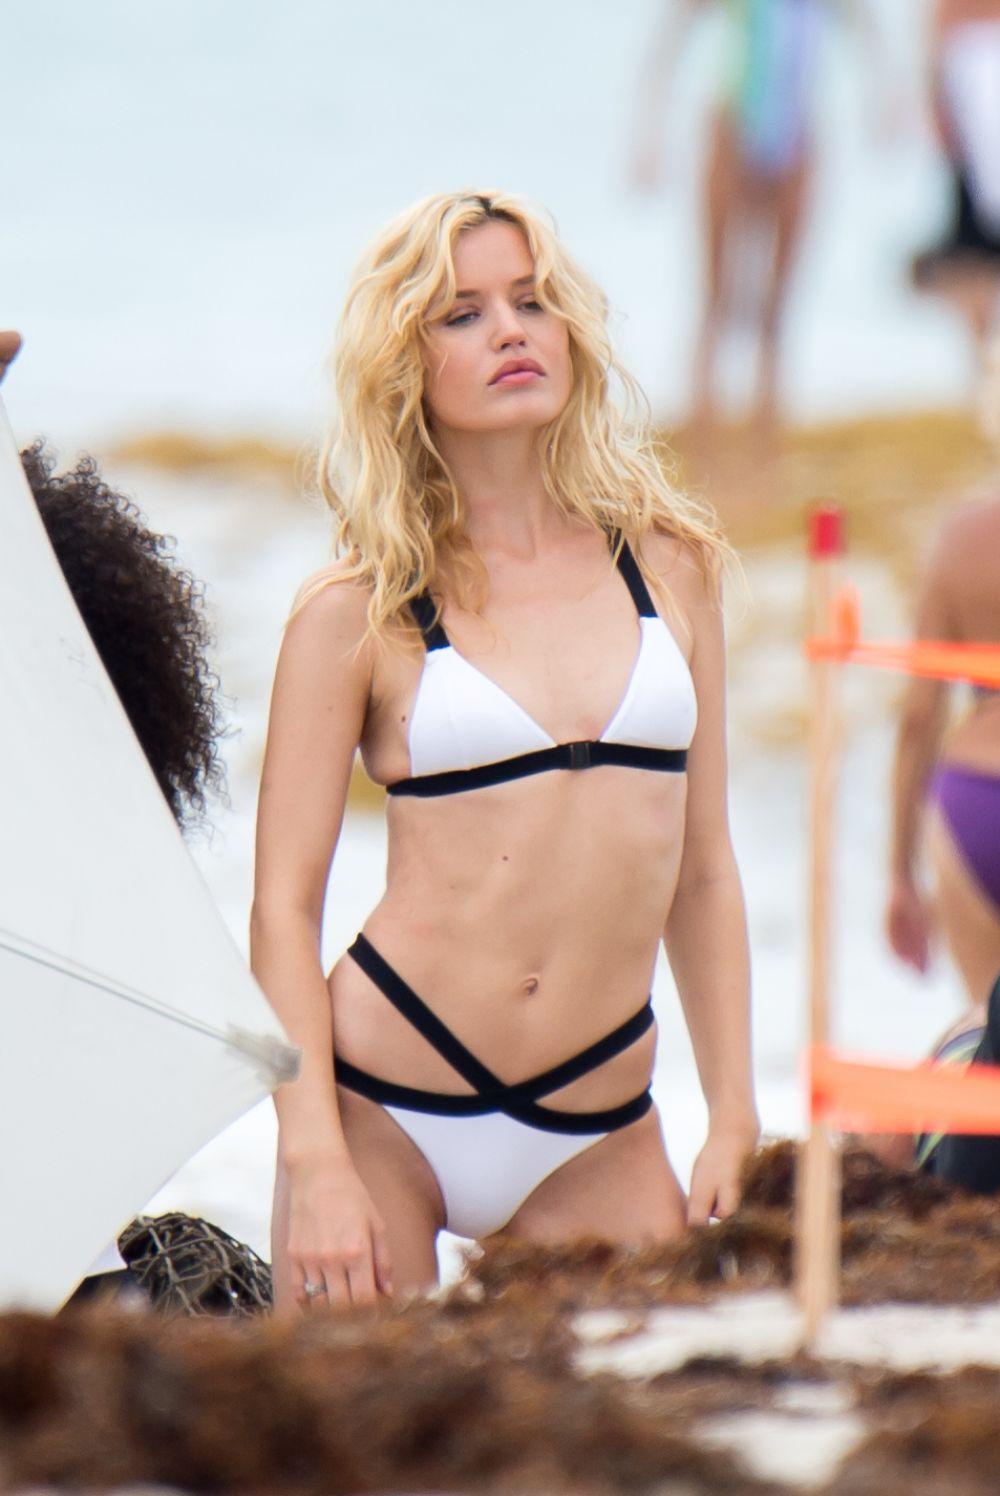 Georgia may jagger for bikini and swimsuit photoshoot in miami